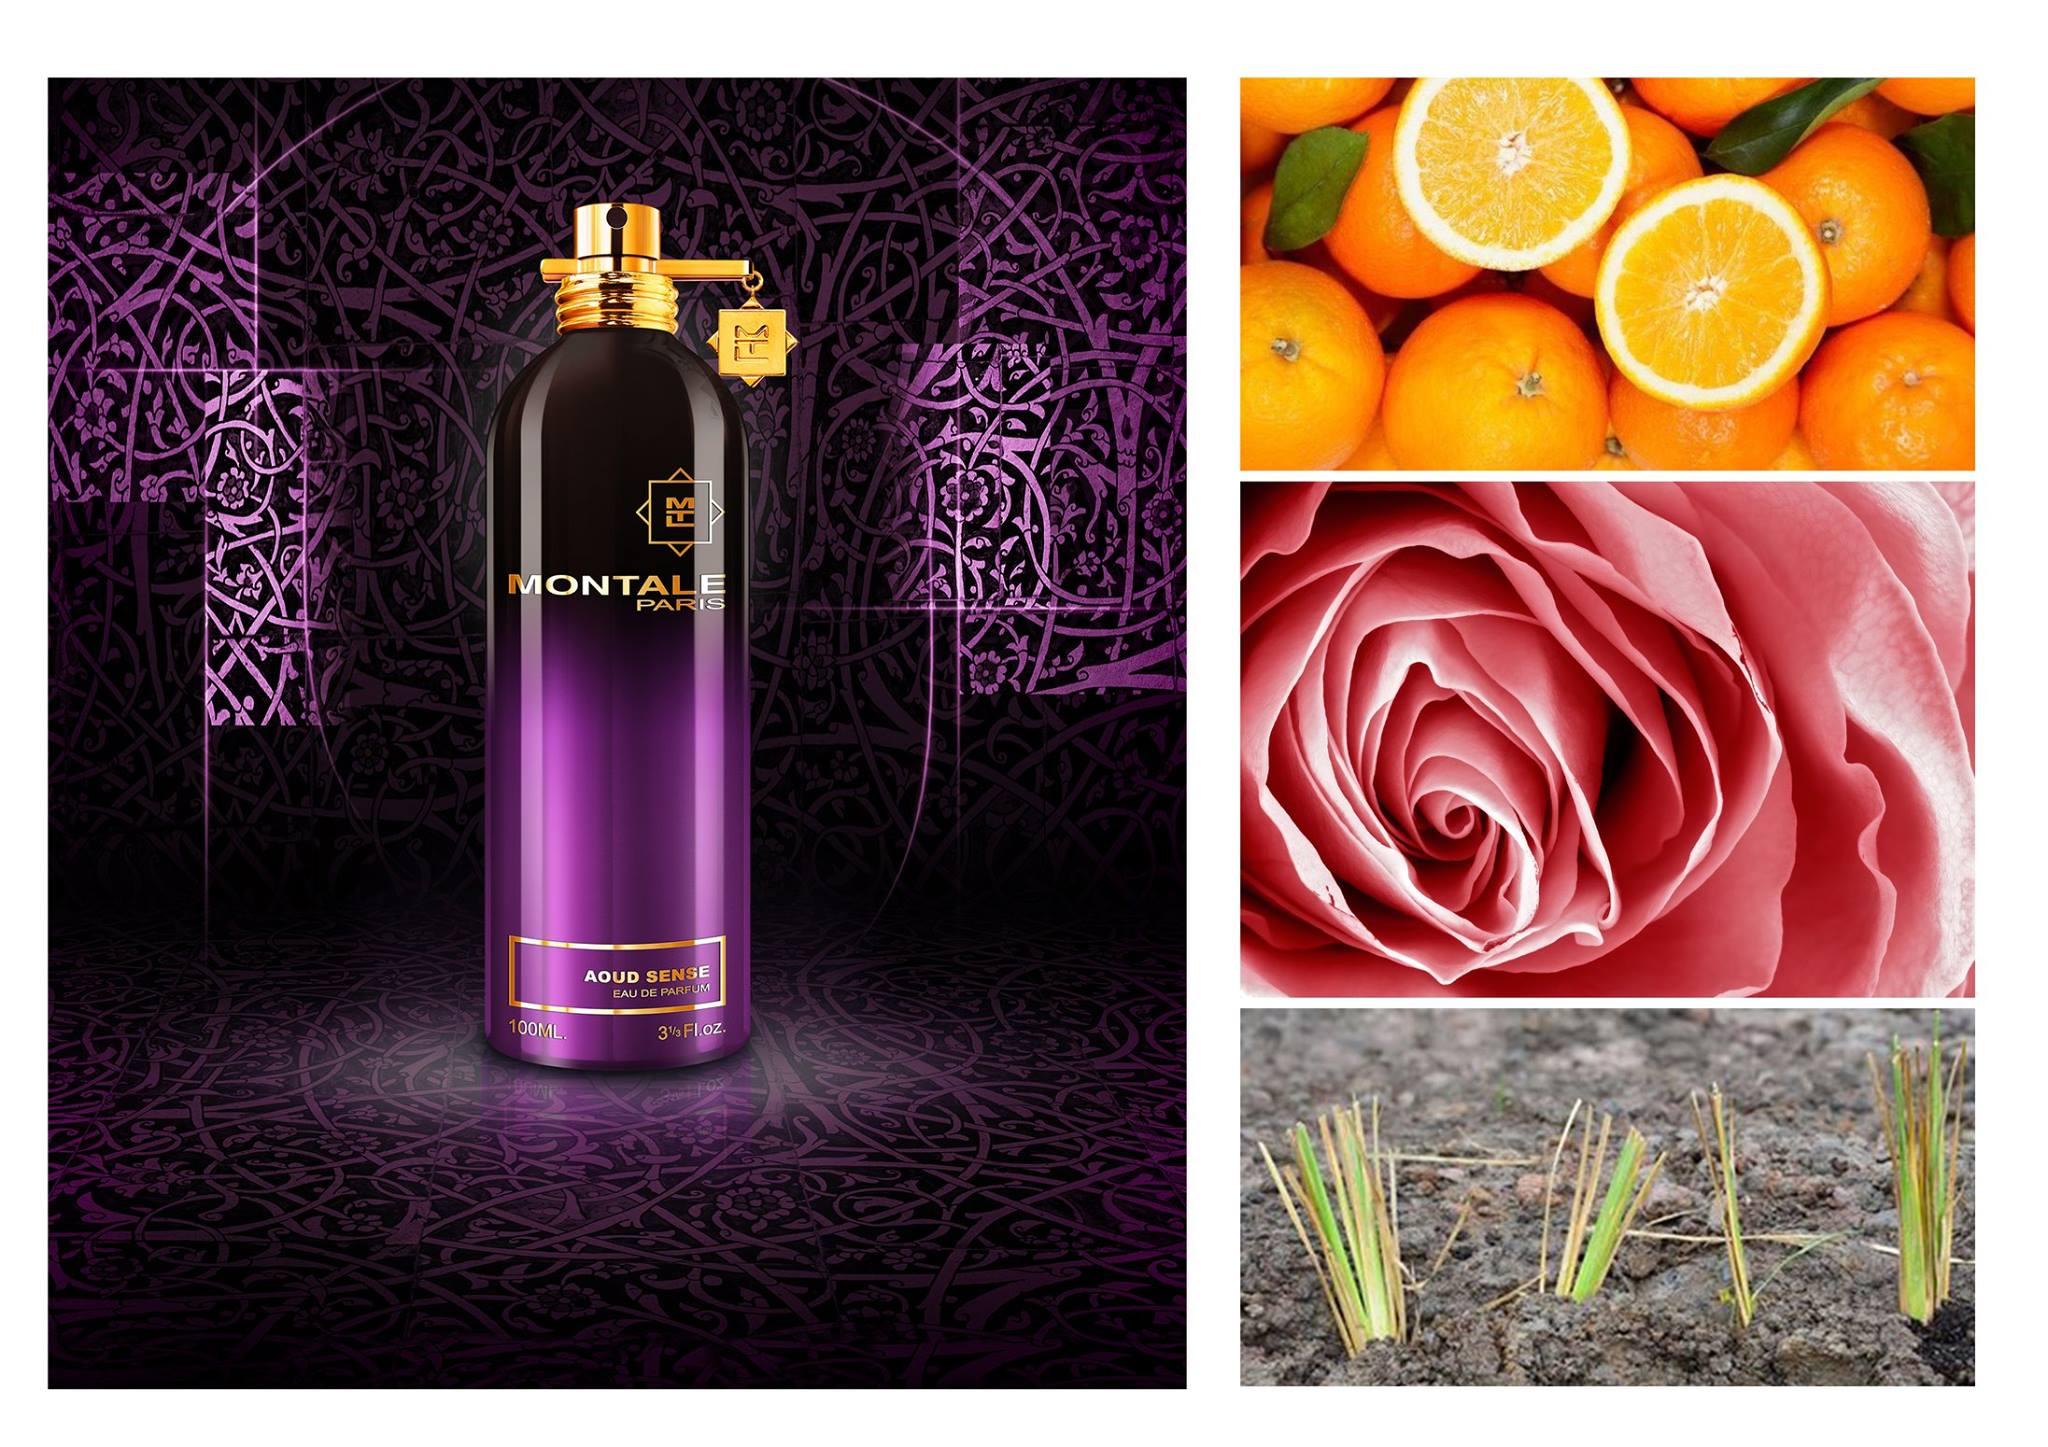 "MONTALE PARFUMS on Twitter: ""#SOTD AOUD SENSE #Montale #Perfume #unisex  #fragrance http://t.co/YLvKhs0yFq http://t.co/wSGai8u2sk"""